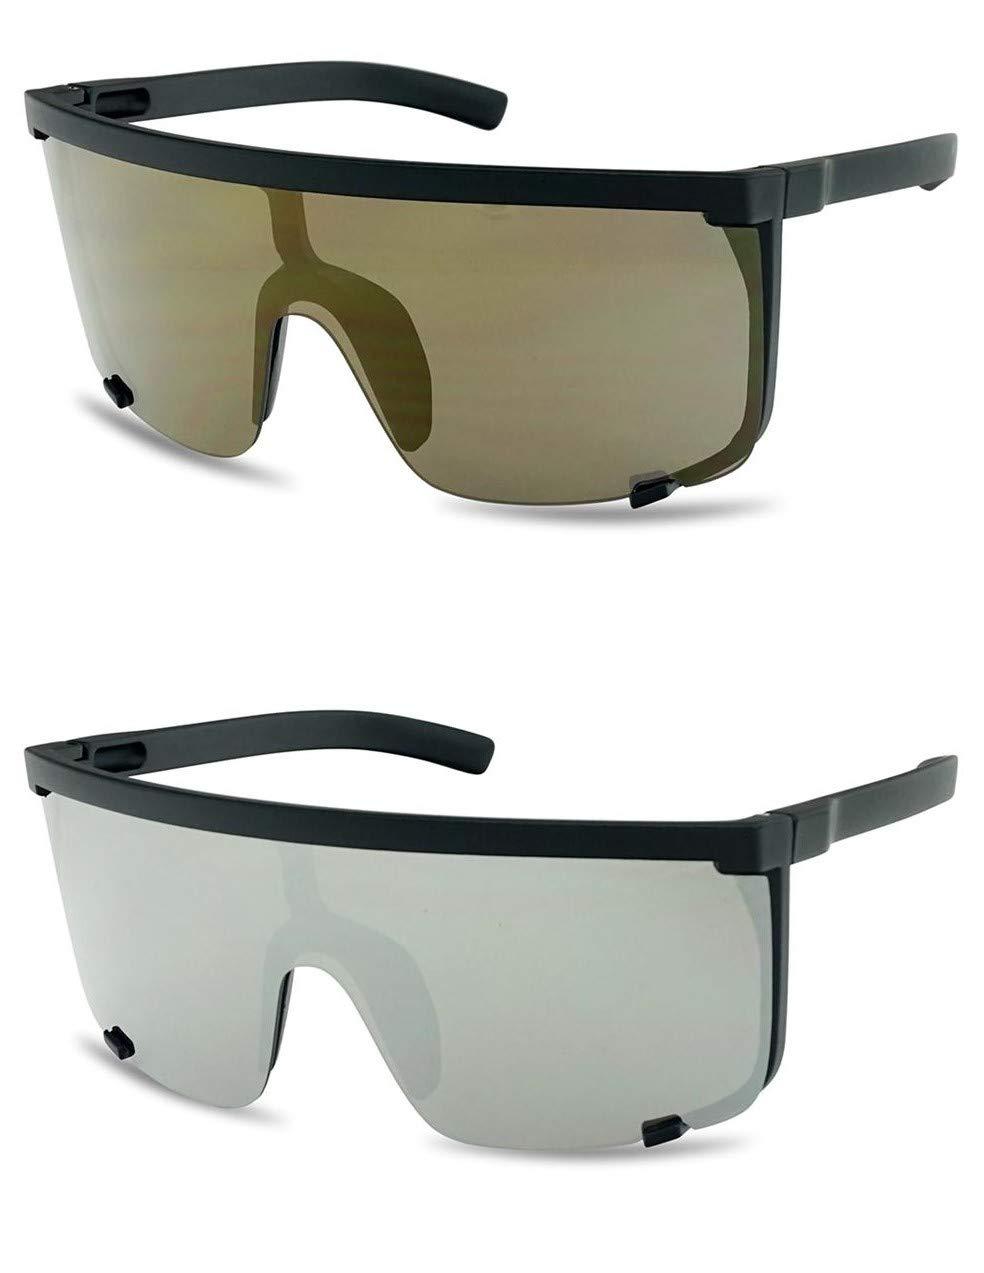 SunglassUP Large Shield Flat top Square Mirrored Visor Sunglasses Semi-Rimless Aviator Style Shades 2-Pack (Bronze Mirror | Silver Mirror (2pack)) by SunglassUP